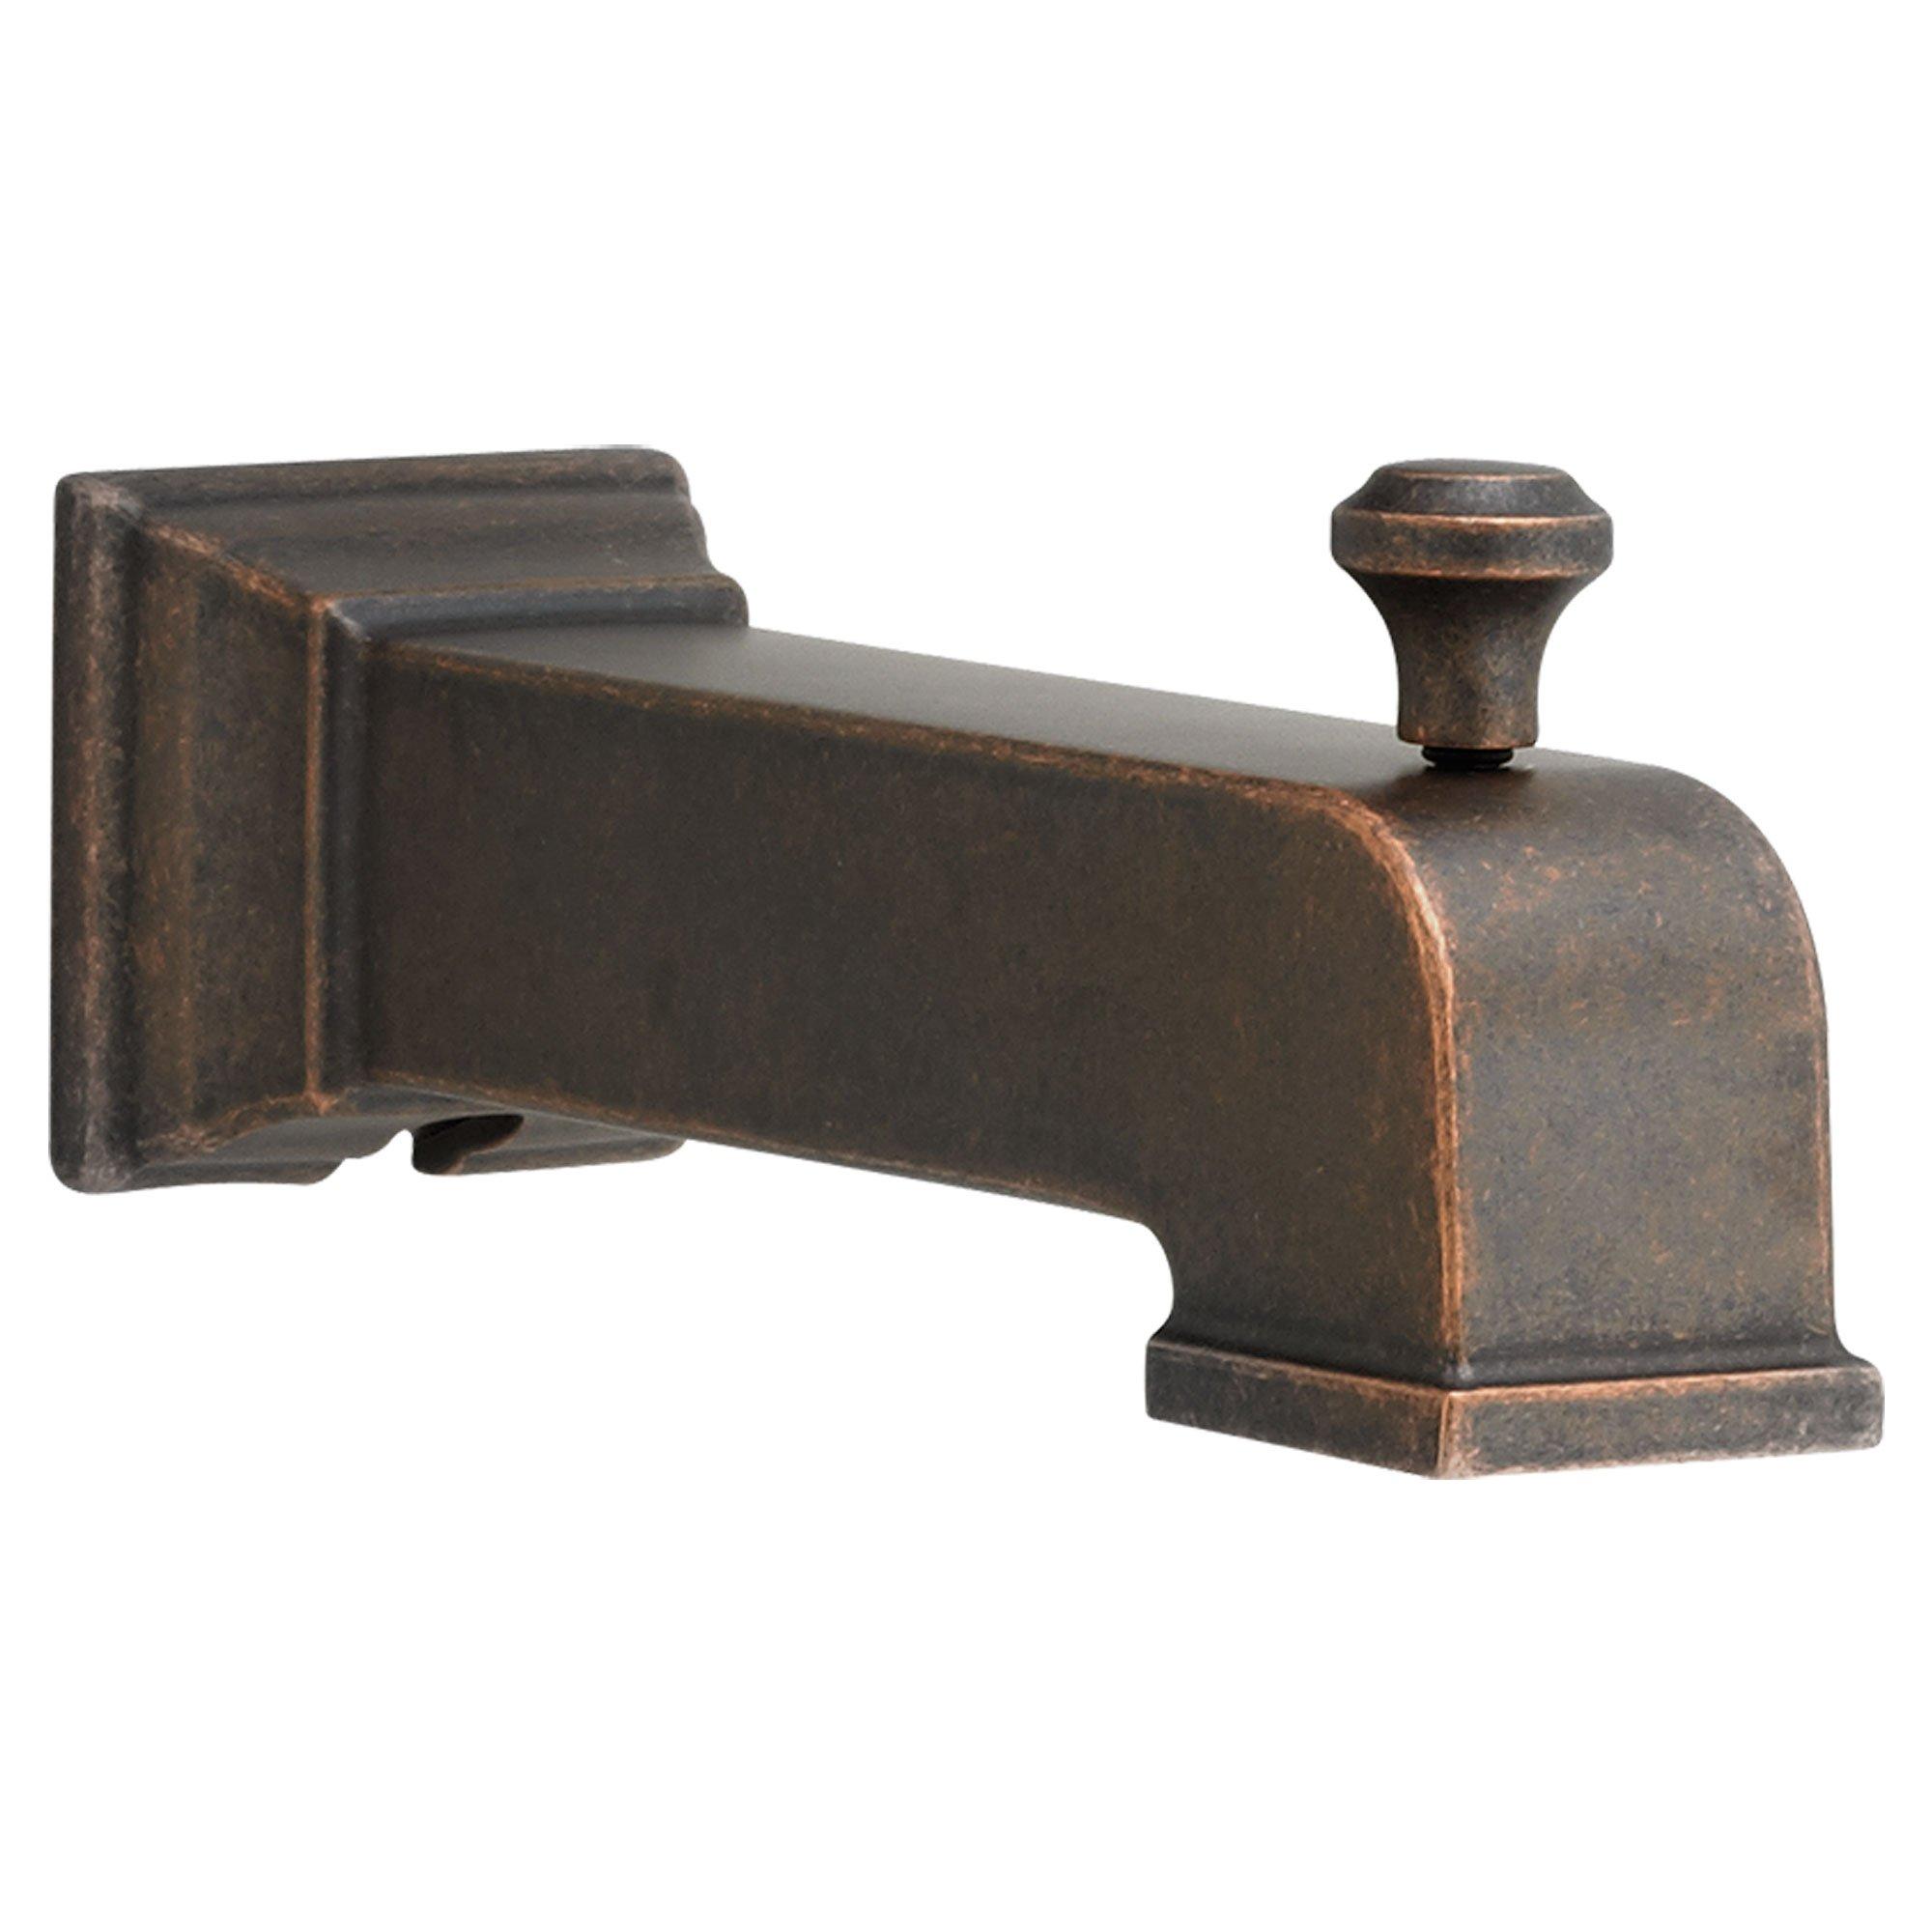 American Standard 8888.088.224 Town Square Slip-On Diverter Tub Spout, Oil Rubbed Bronze